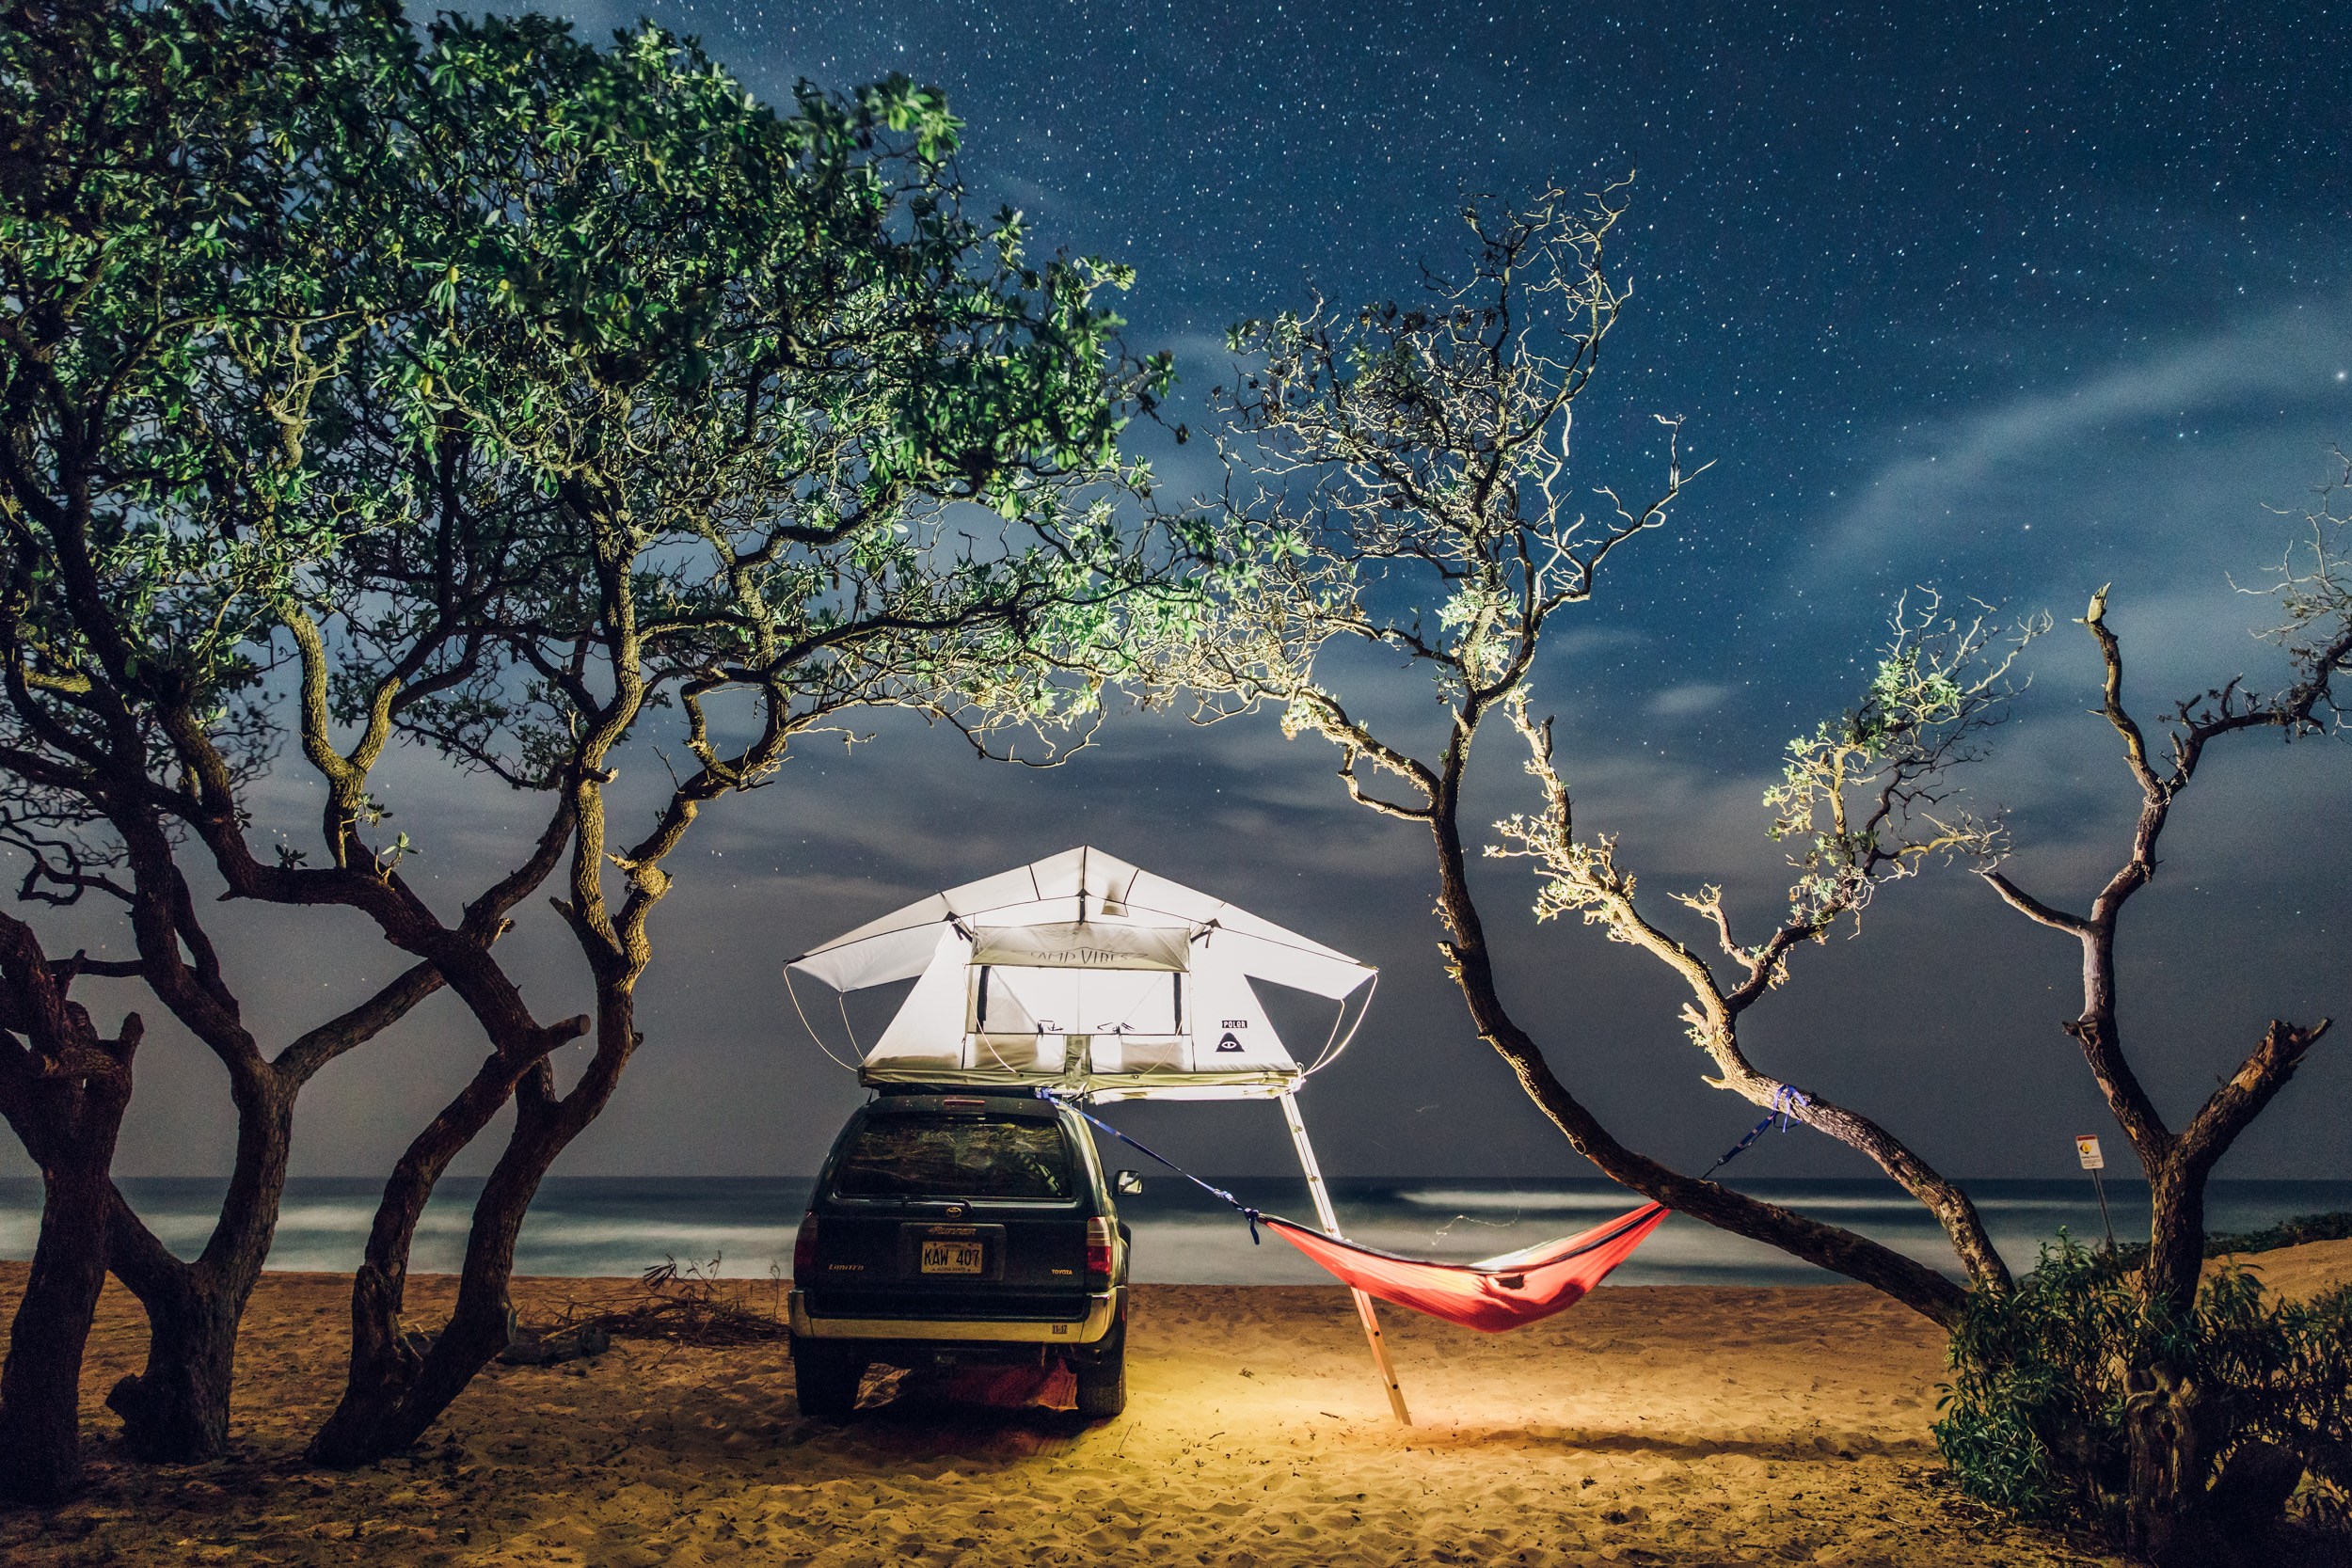 Hawaii-Overland-Kauai-roof top tent-camping-polihale-rental-2.jpg